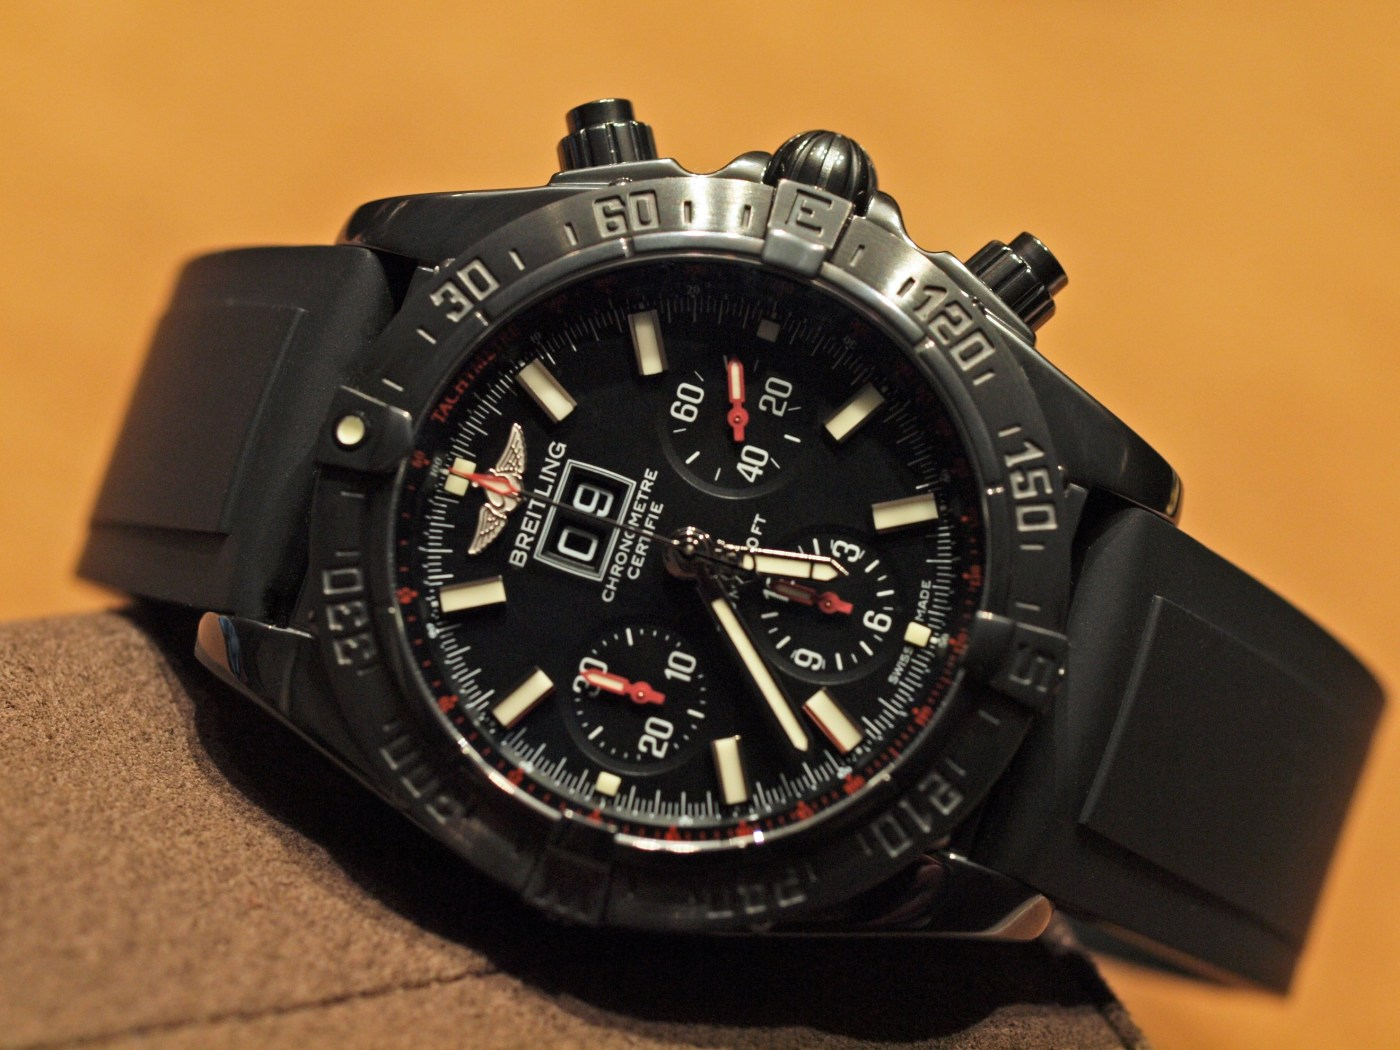 Breitling Blackbird Blacksteel DLC Chronograph